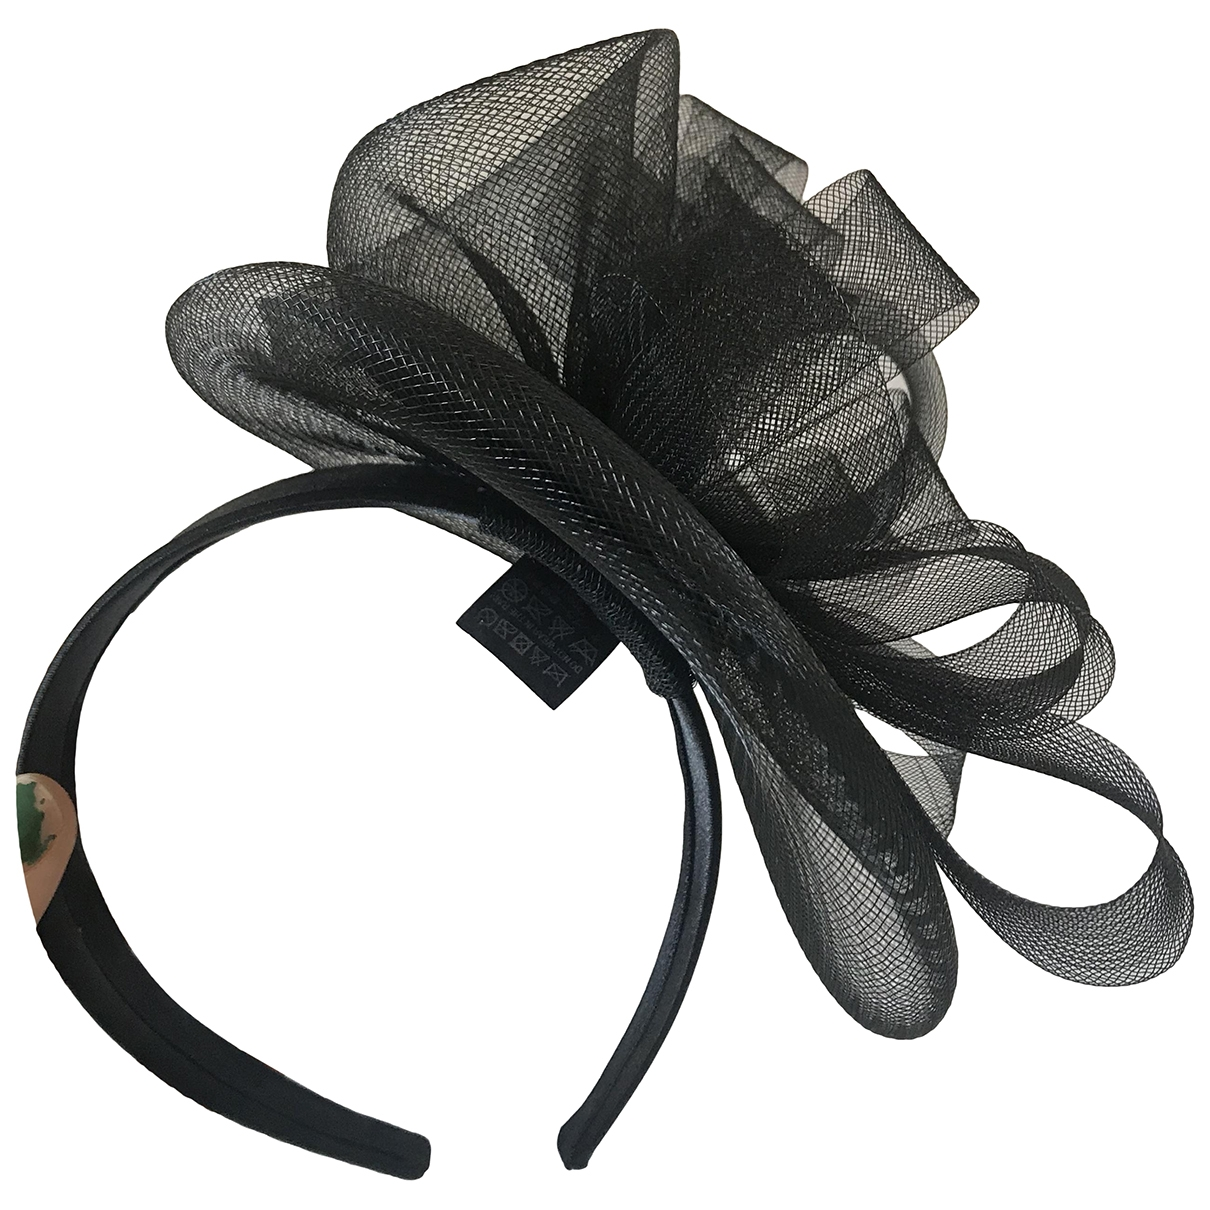 Jaeger \N Black hat for Women M International